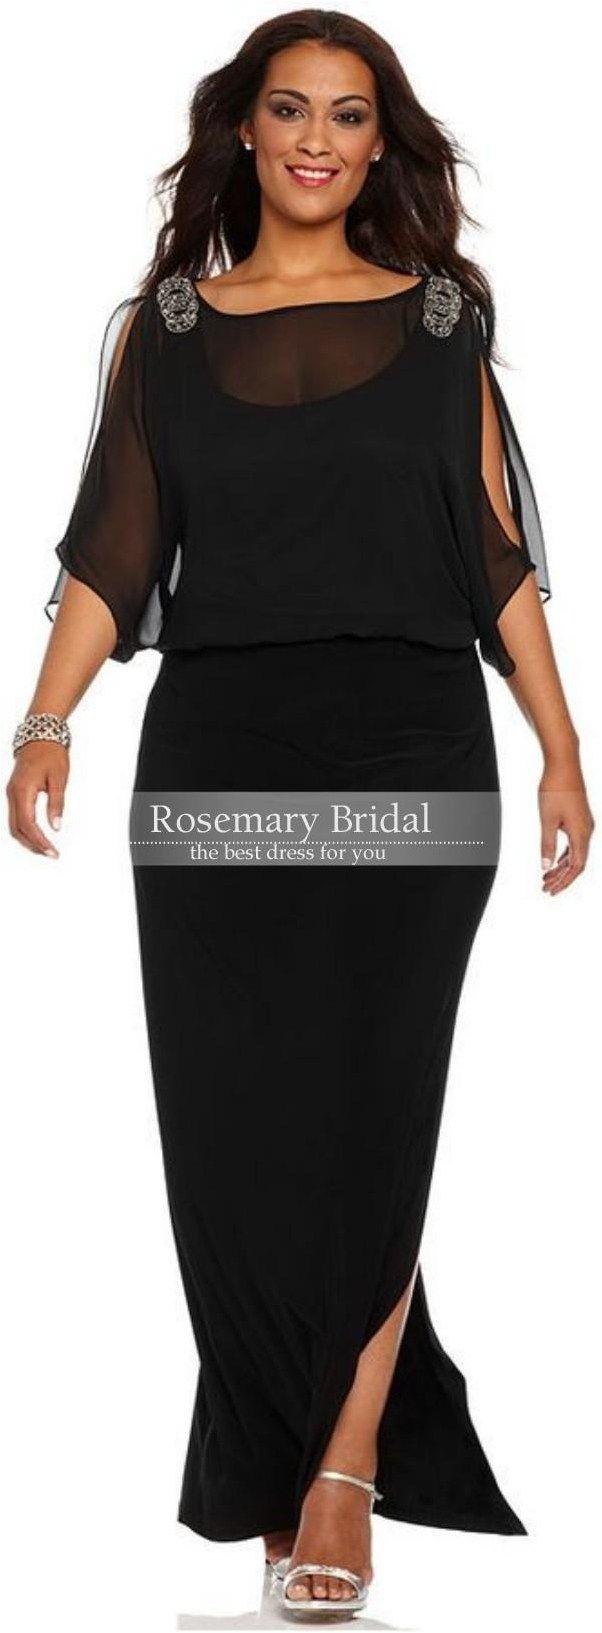 Elegant Mother Of The Bride Dresses Trends Inspiration & Ideas (69)